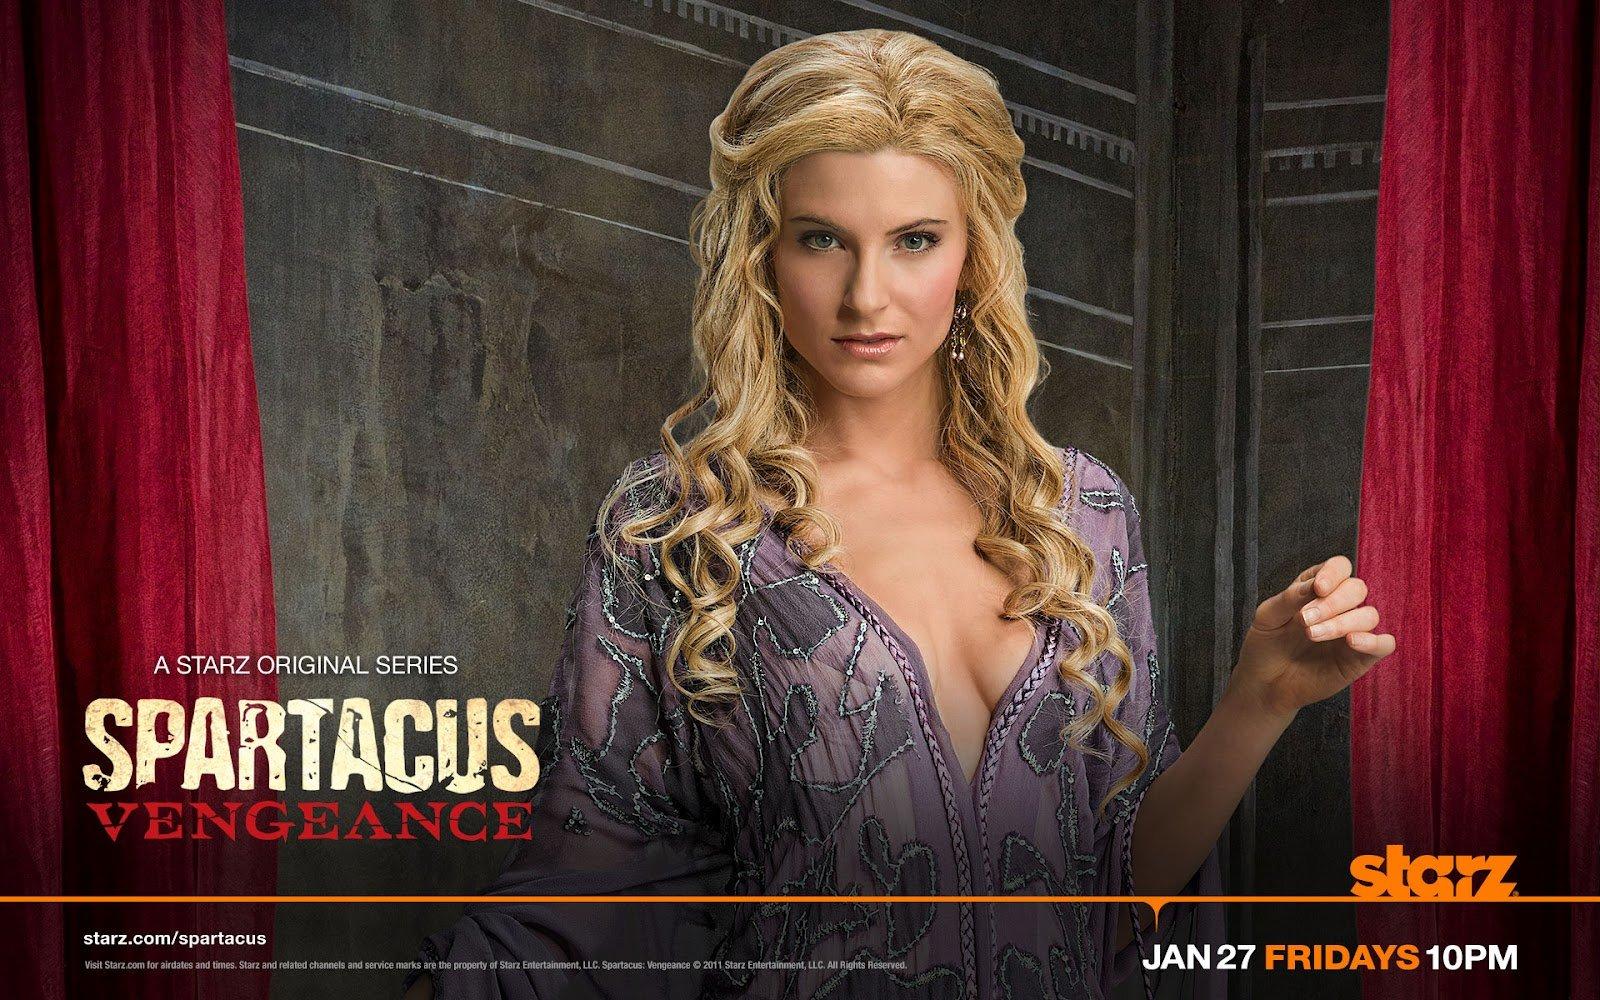 Spartacus: Vengeance. Viva Bianca as Ilithyia